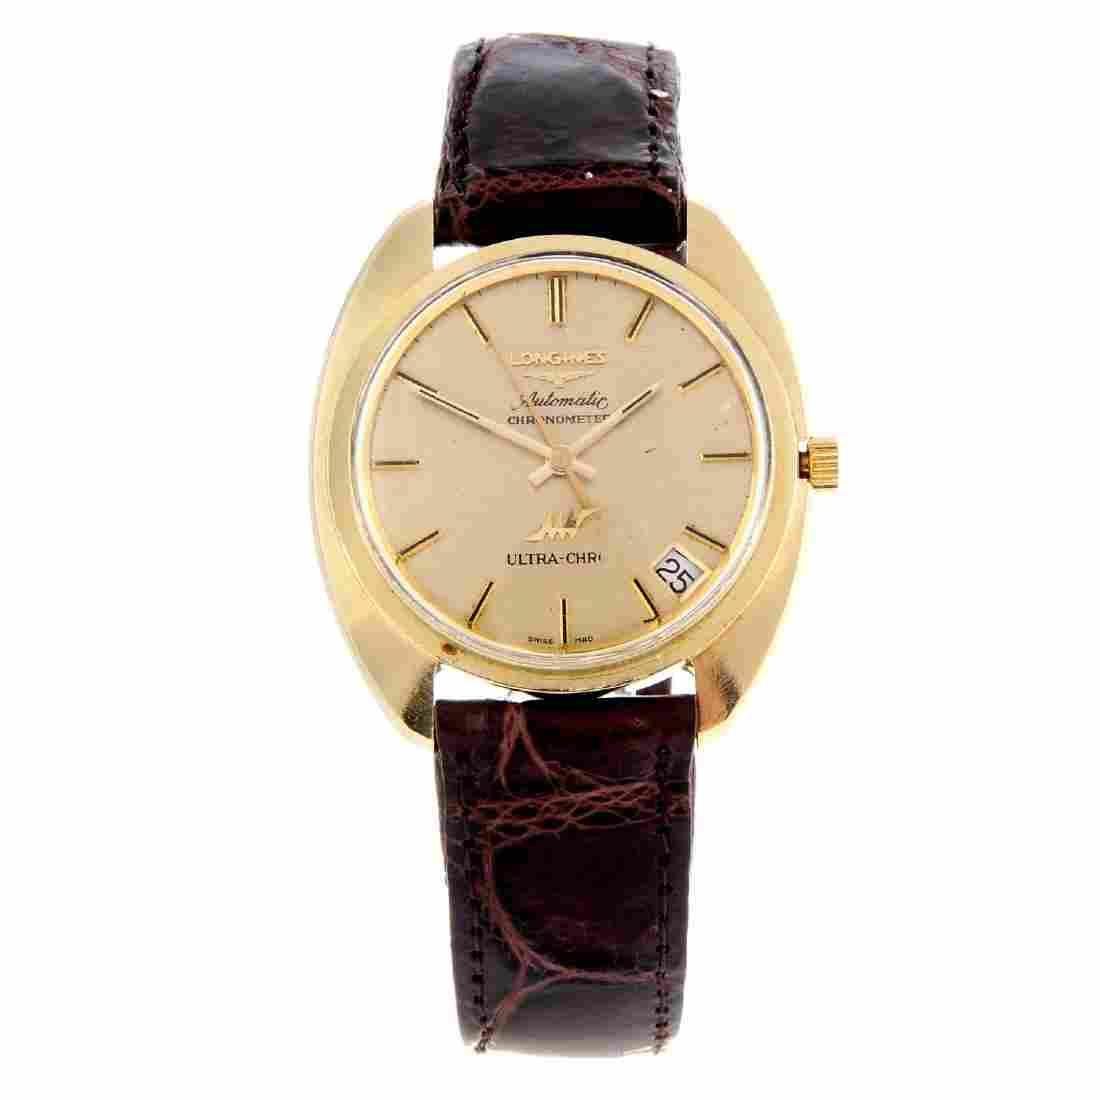 LONGINES - a gentleman's Ultra-Chron wrist watch.